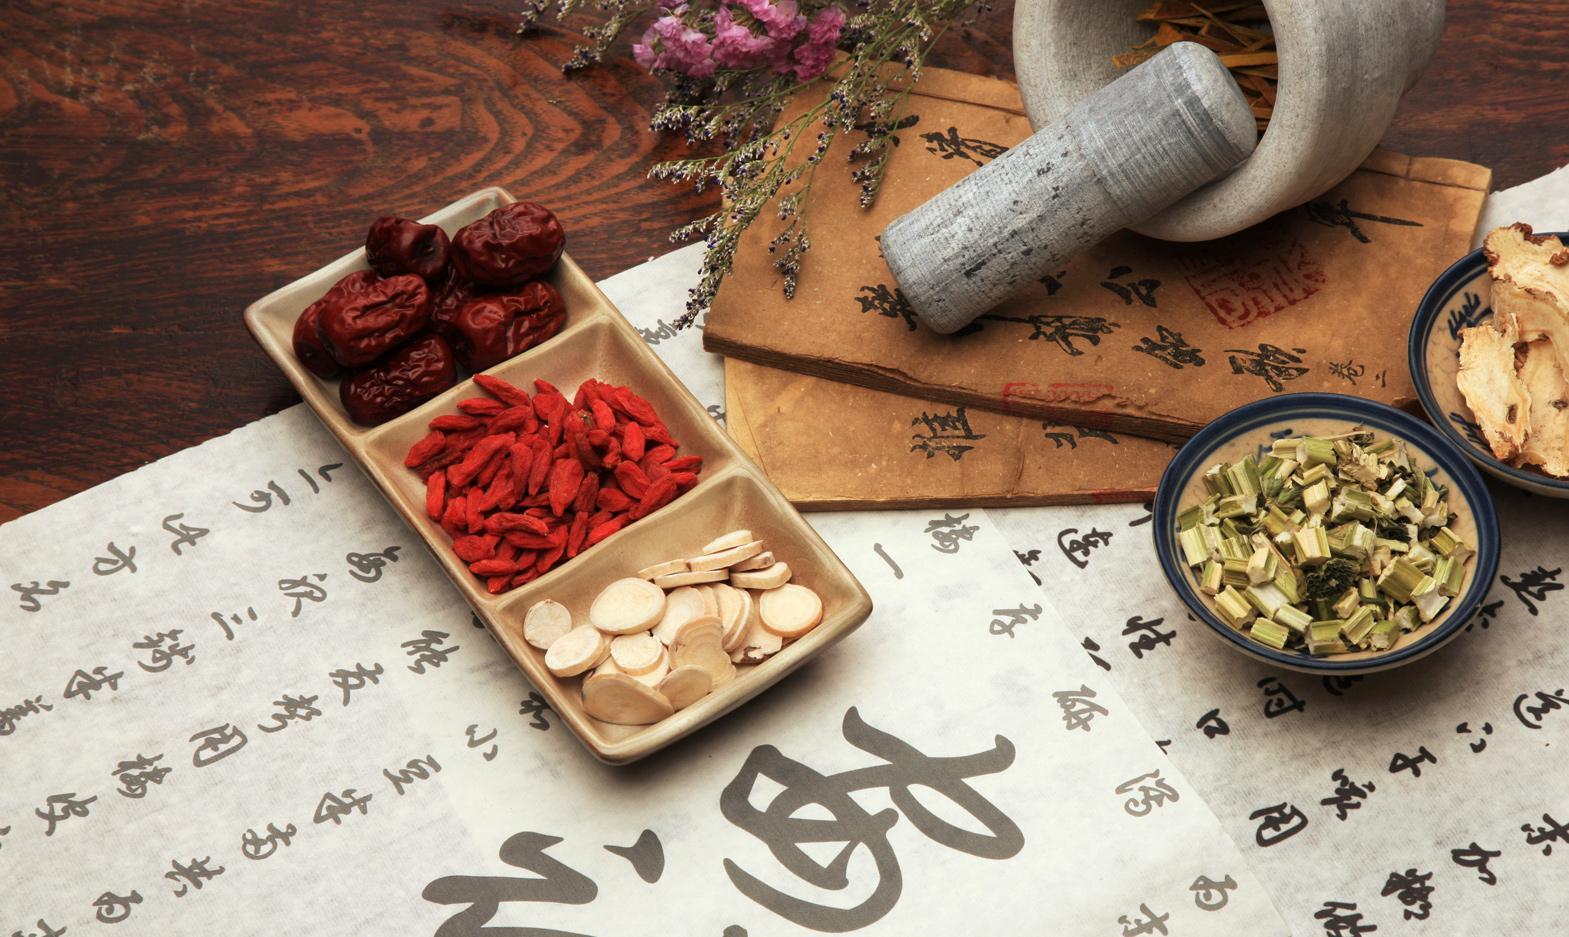 traditional chinese medicine 3.jpg